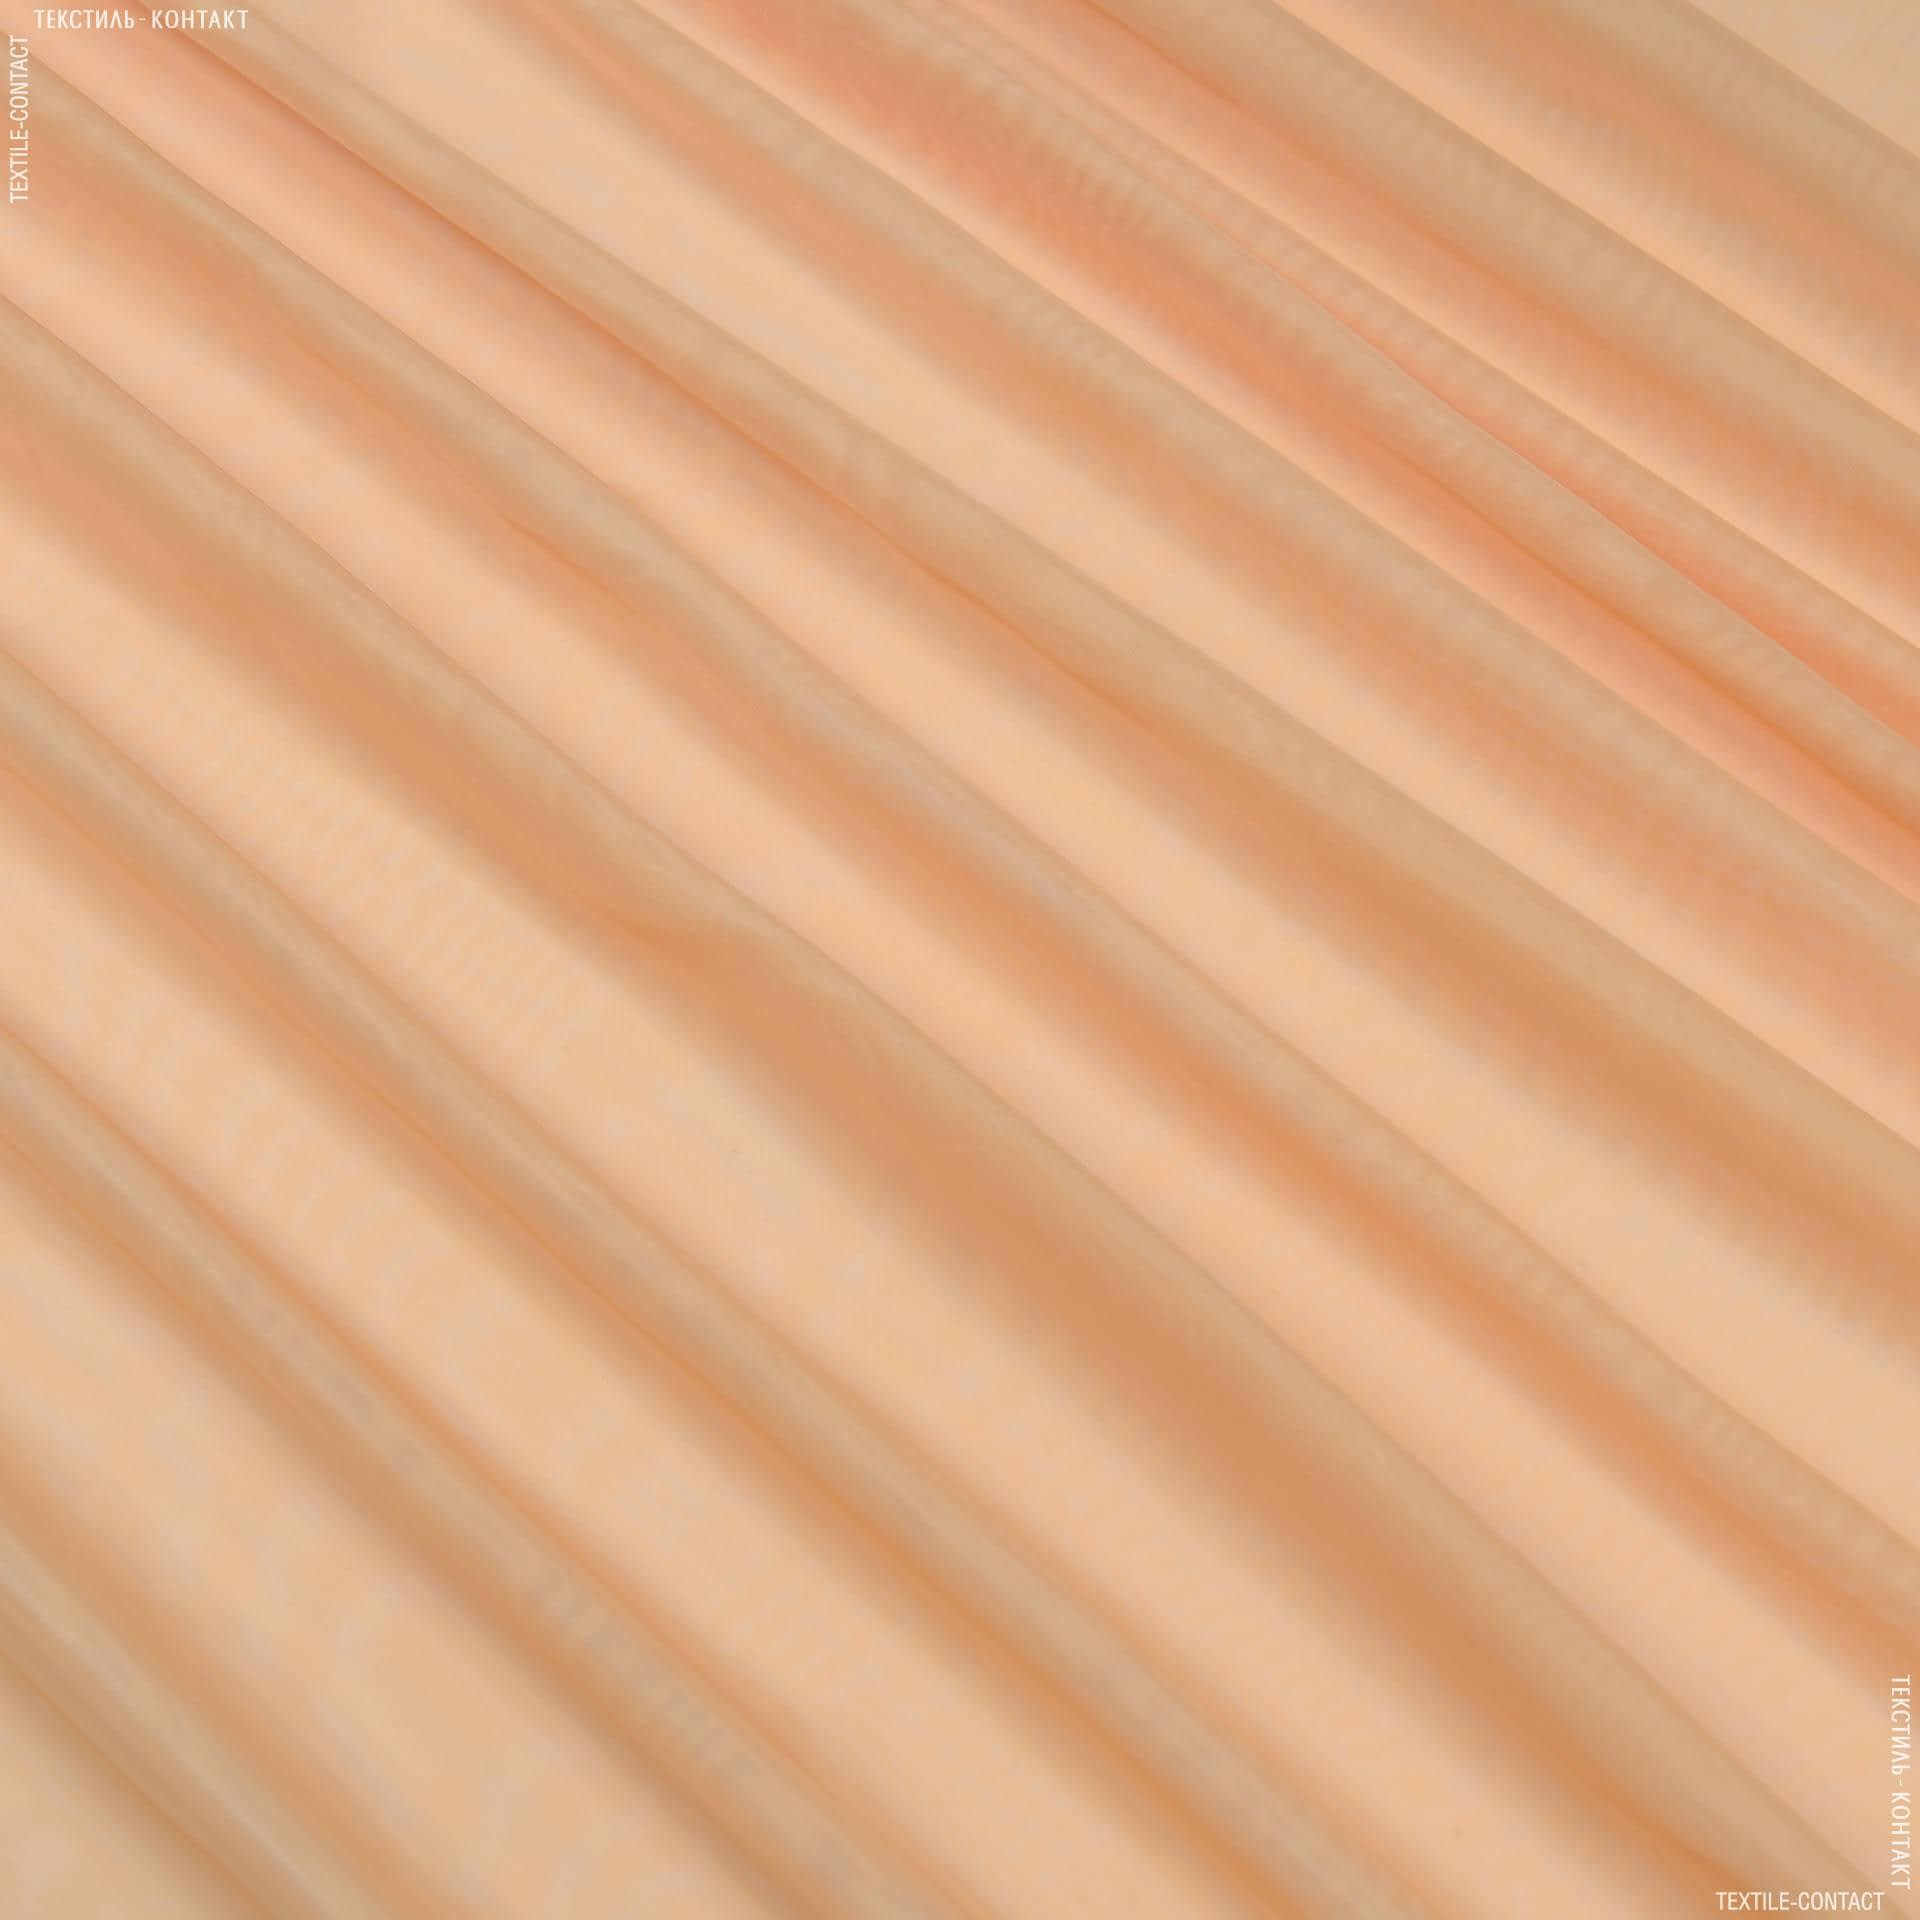 Тканини гардинні тканини - Тюль   вуаль    персик